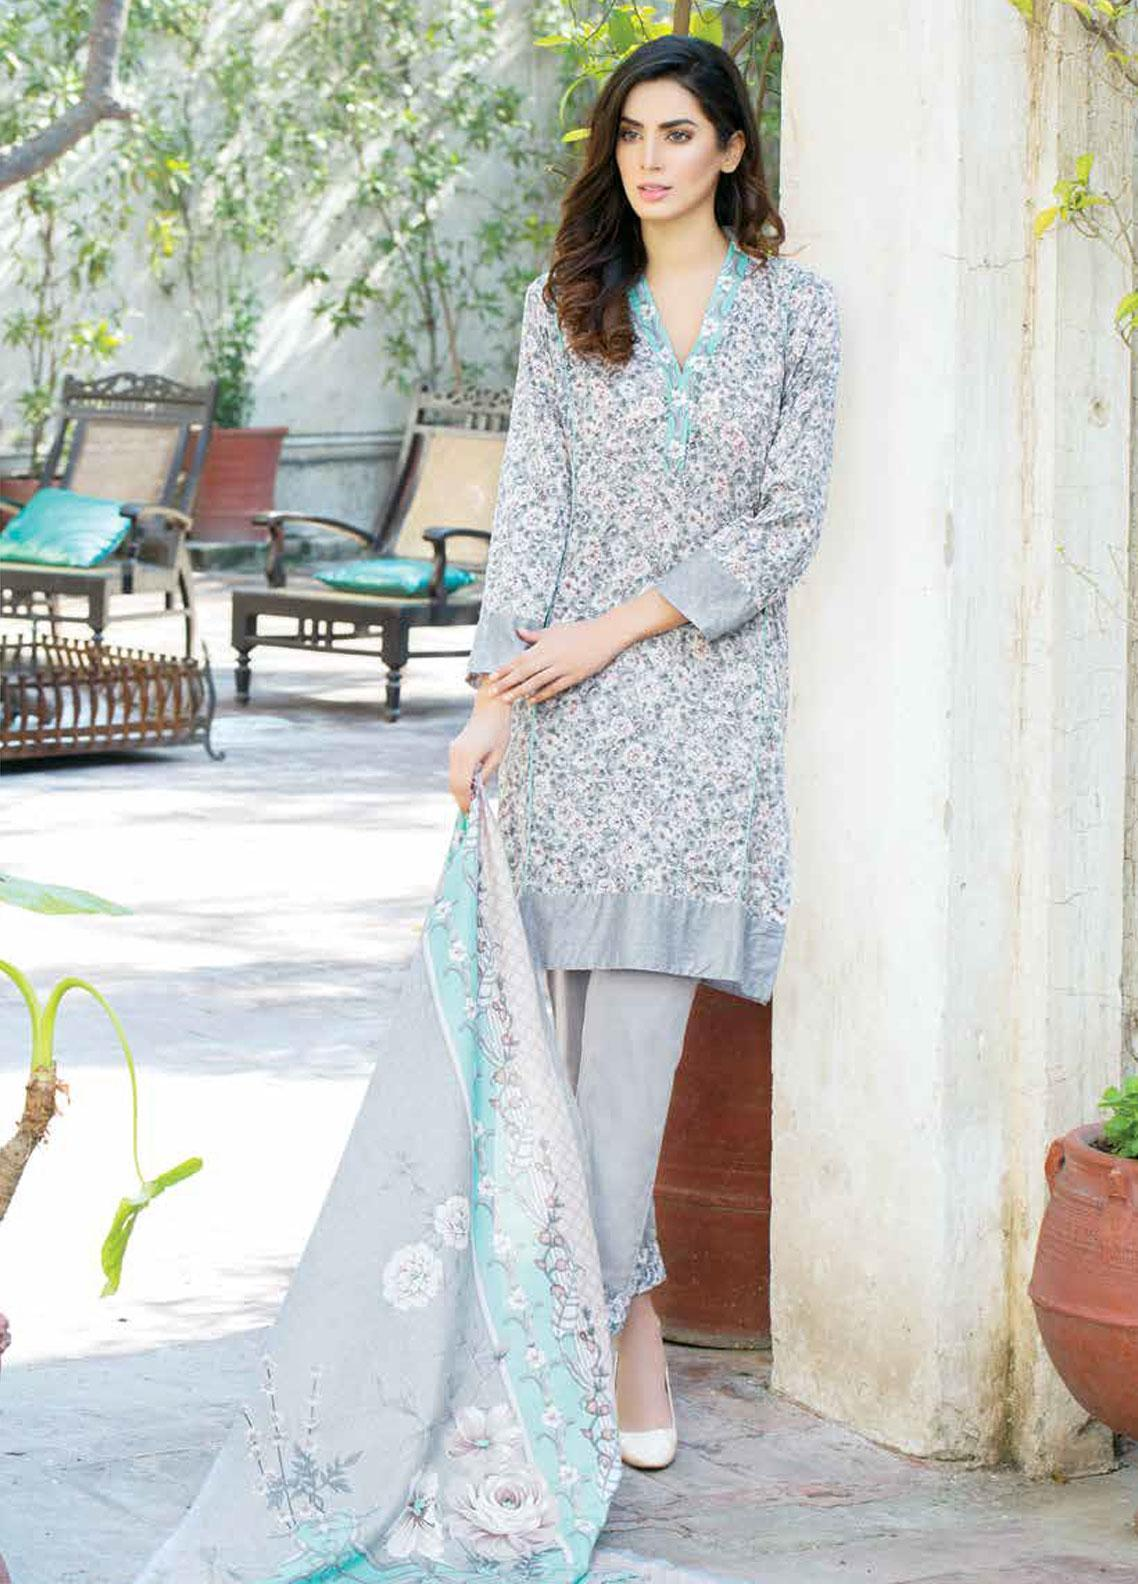 b3f750ba6fb Bridal Maxi Dress Price In Pakistan - Gomes Weine AG